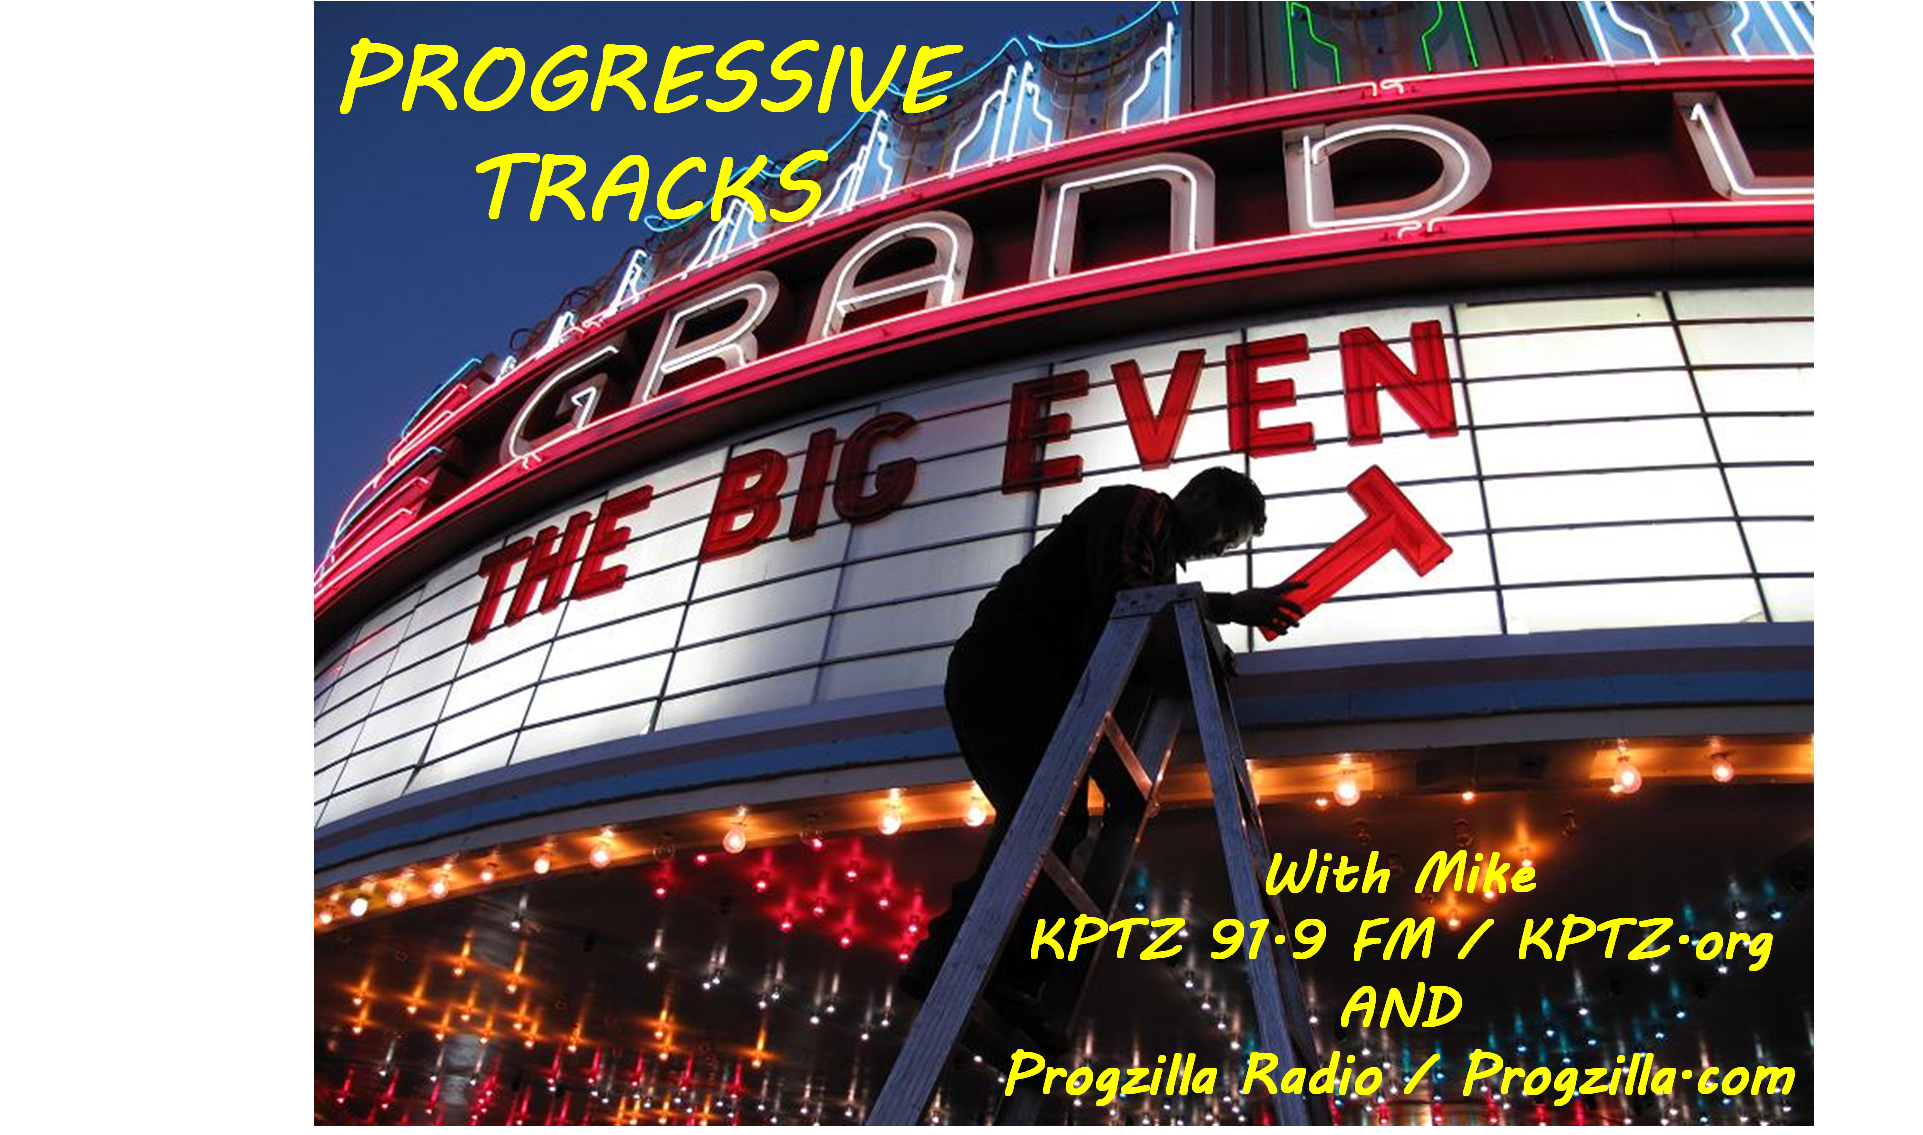 Progressive Tracks Show #204 (4-3-2017) The Big Event